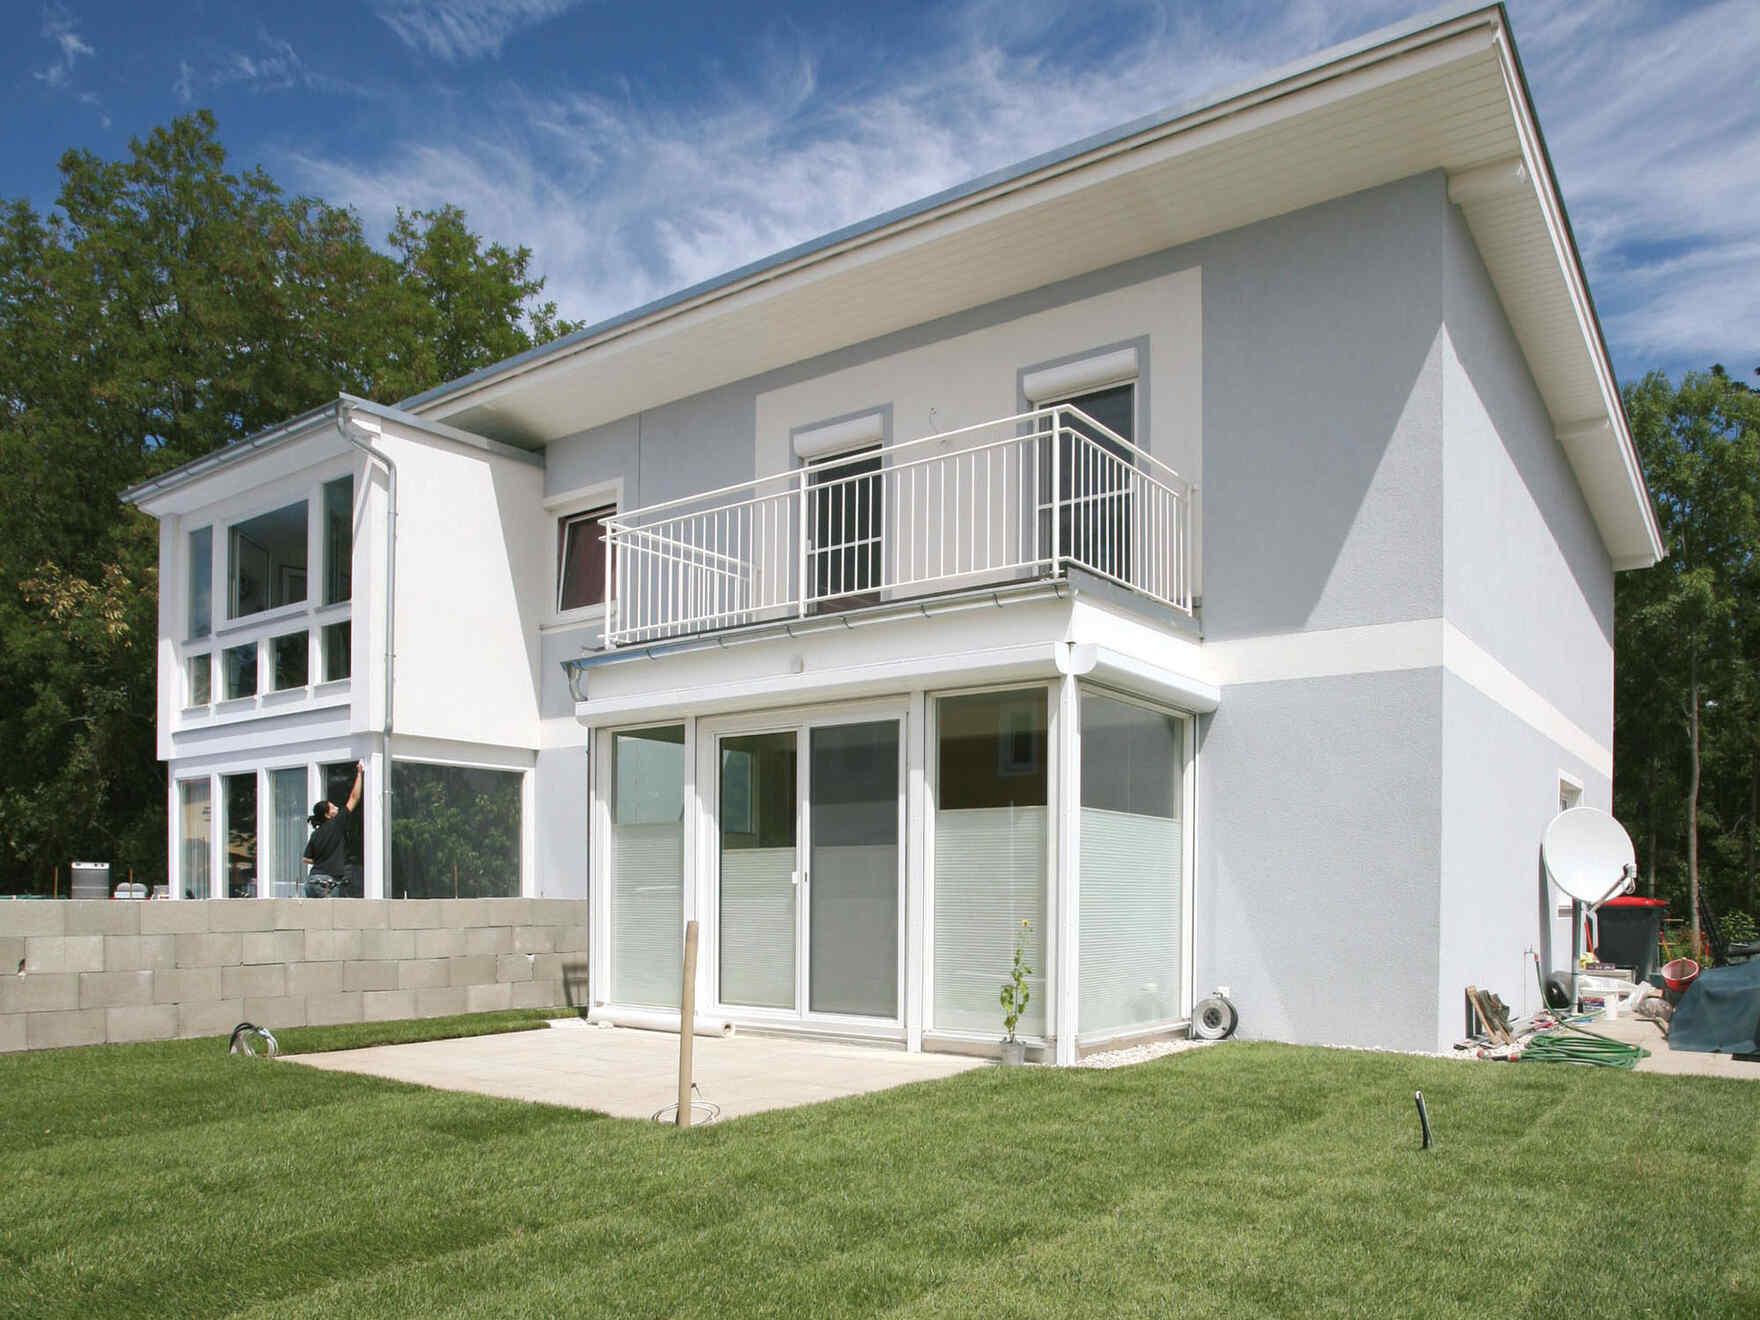 casa prefabbricata in legno Doppelhaus-Anlage Sonnendorf